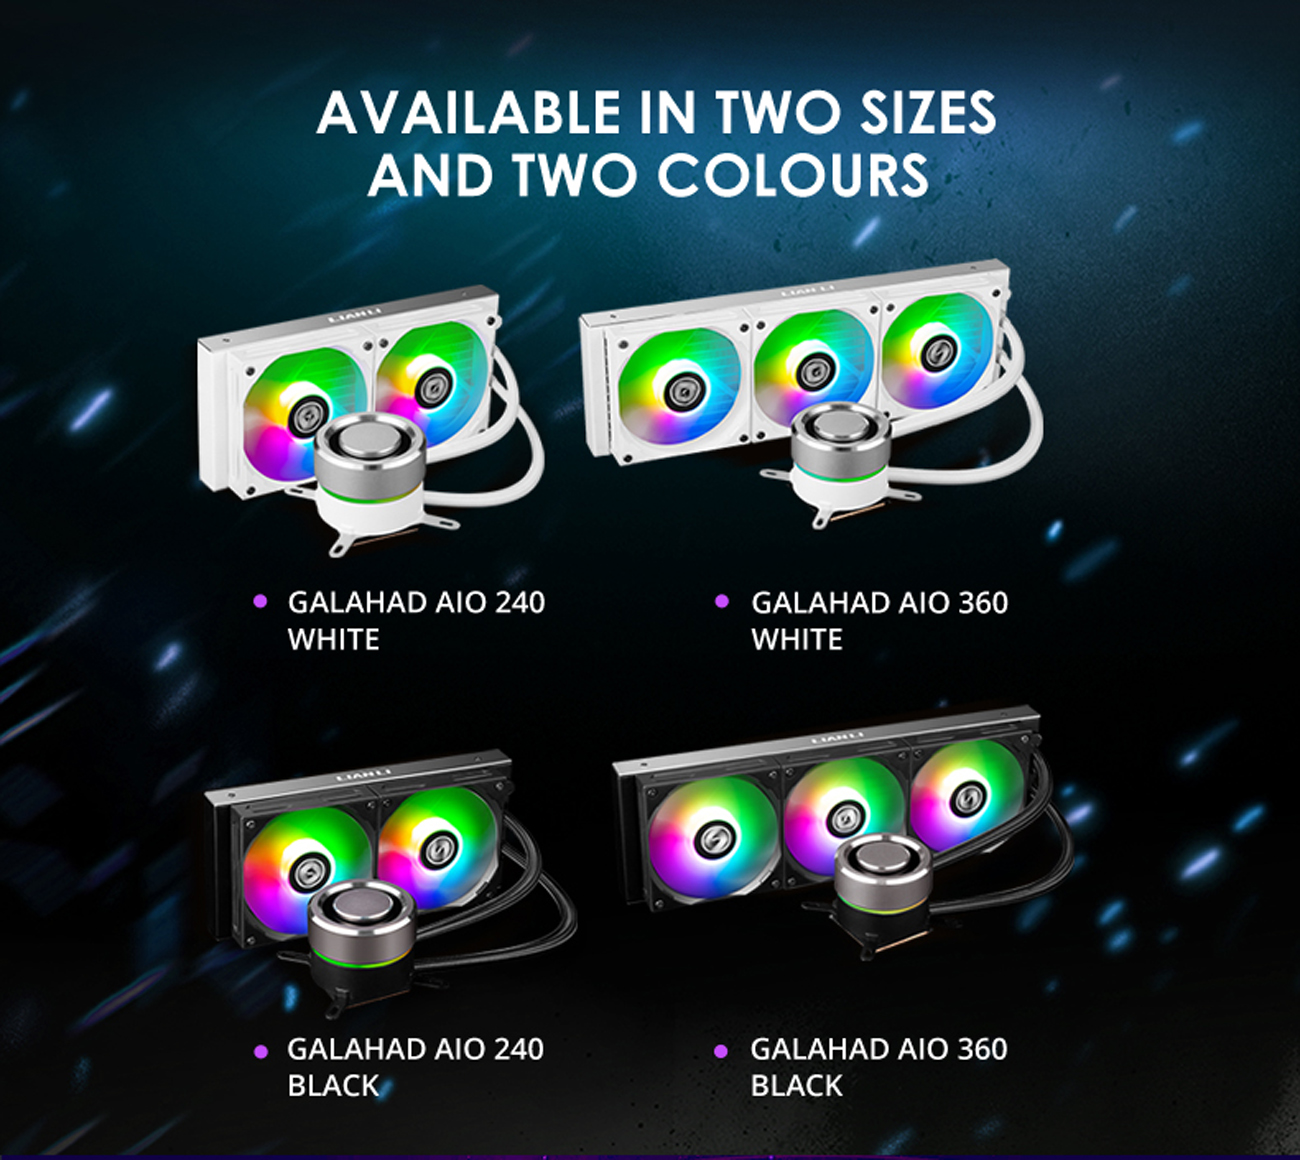 LIAN LI GALAHAD AIO 360 RGB BLACK, Triple 120mm Addressable RGB Fans AIO  CPU Liquid Cooler - Newegg.com